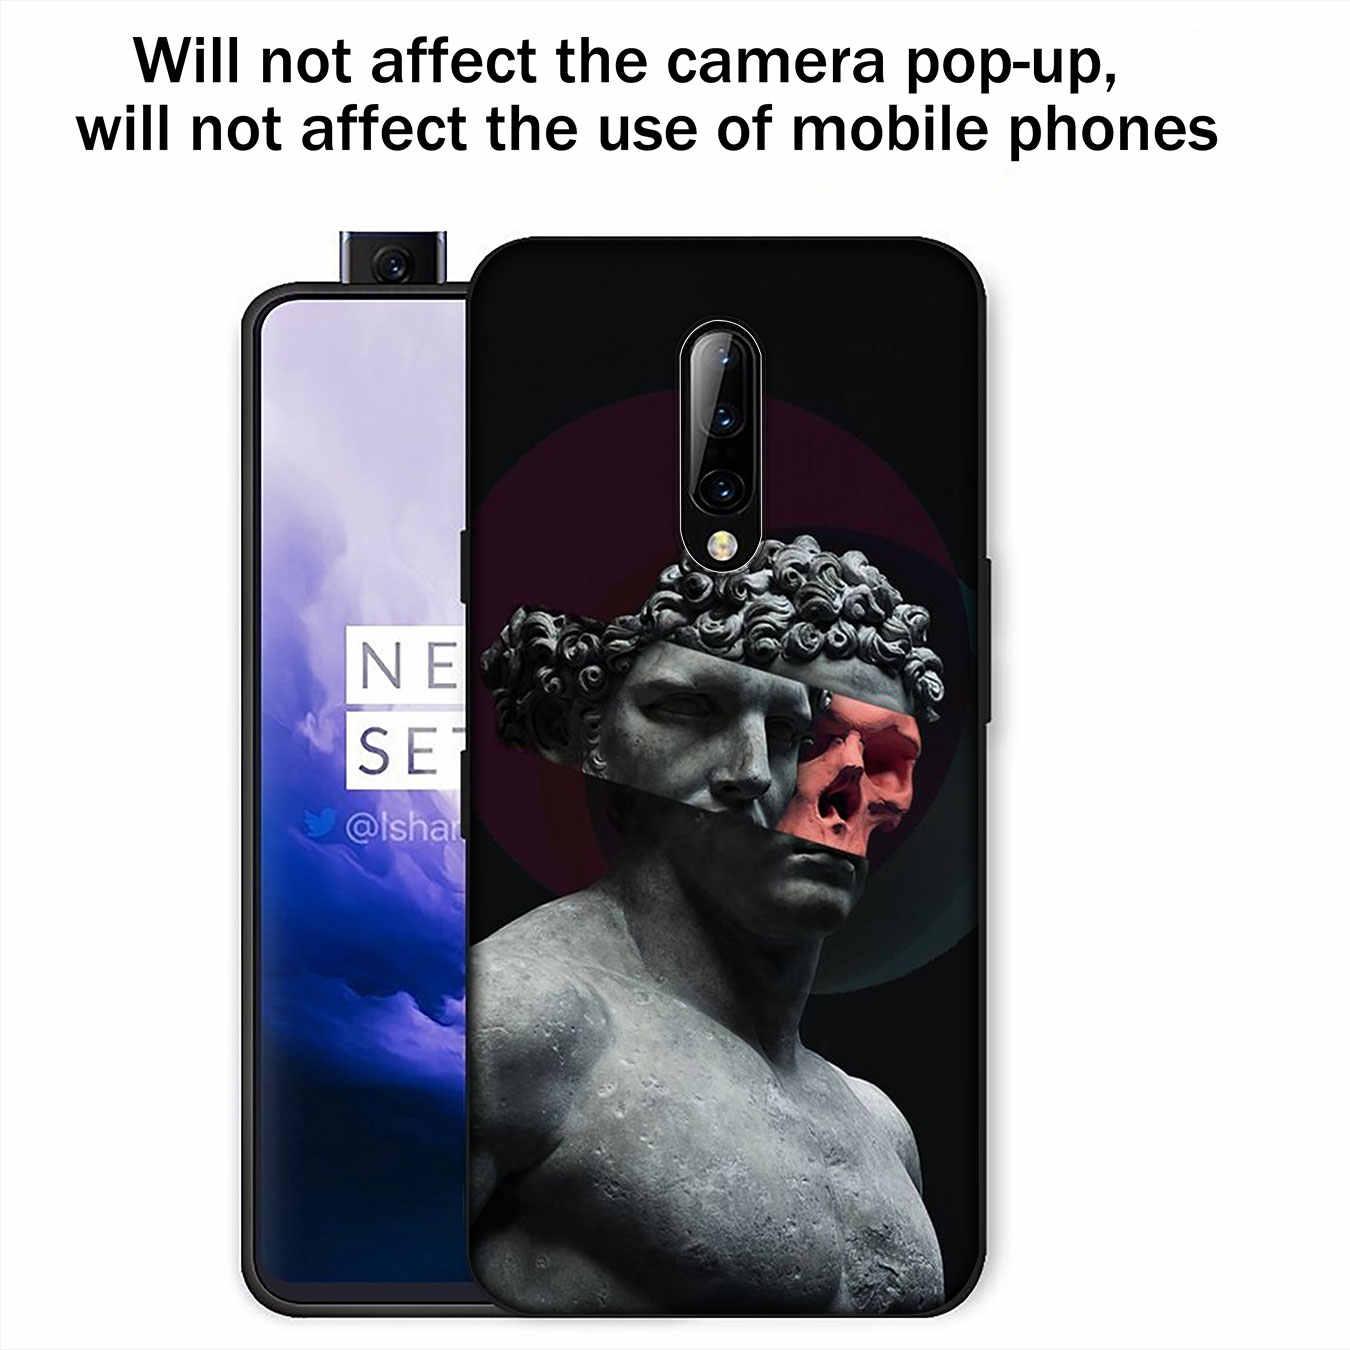 Funda de teléfono de silicona negra TPU suave con estatua de arte David De Van Gogh para OnePlus 7T 7 Pro 6 6T 5 5T One Plus 7Pro